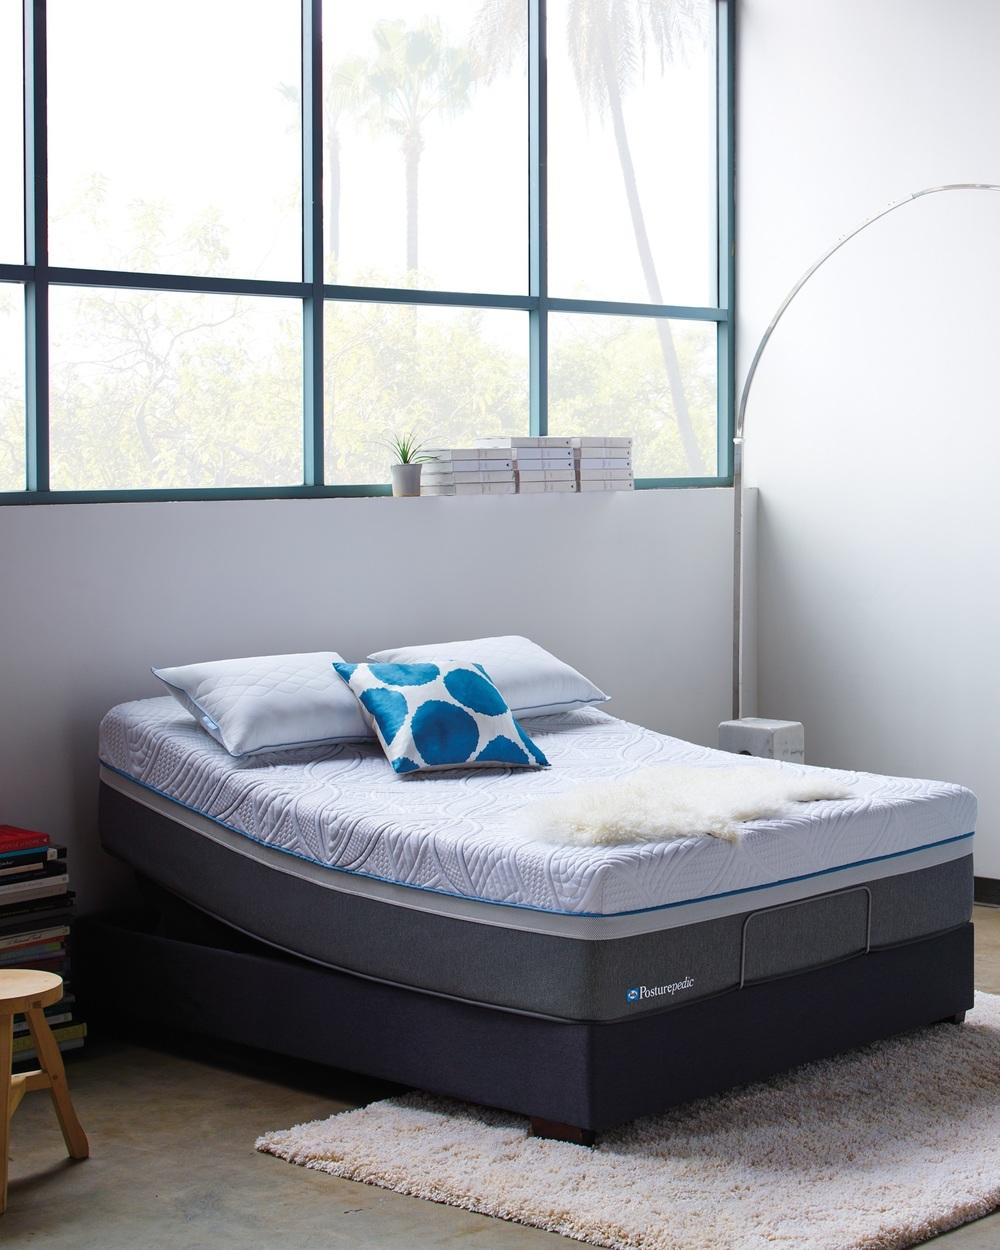 HYBRID (SPRING & FOAM) BEDS